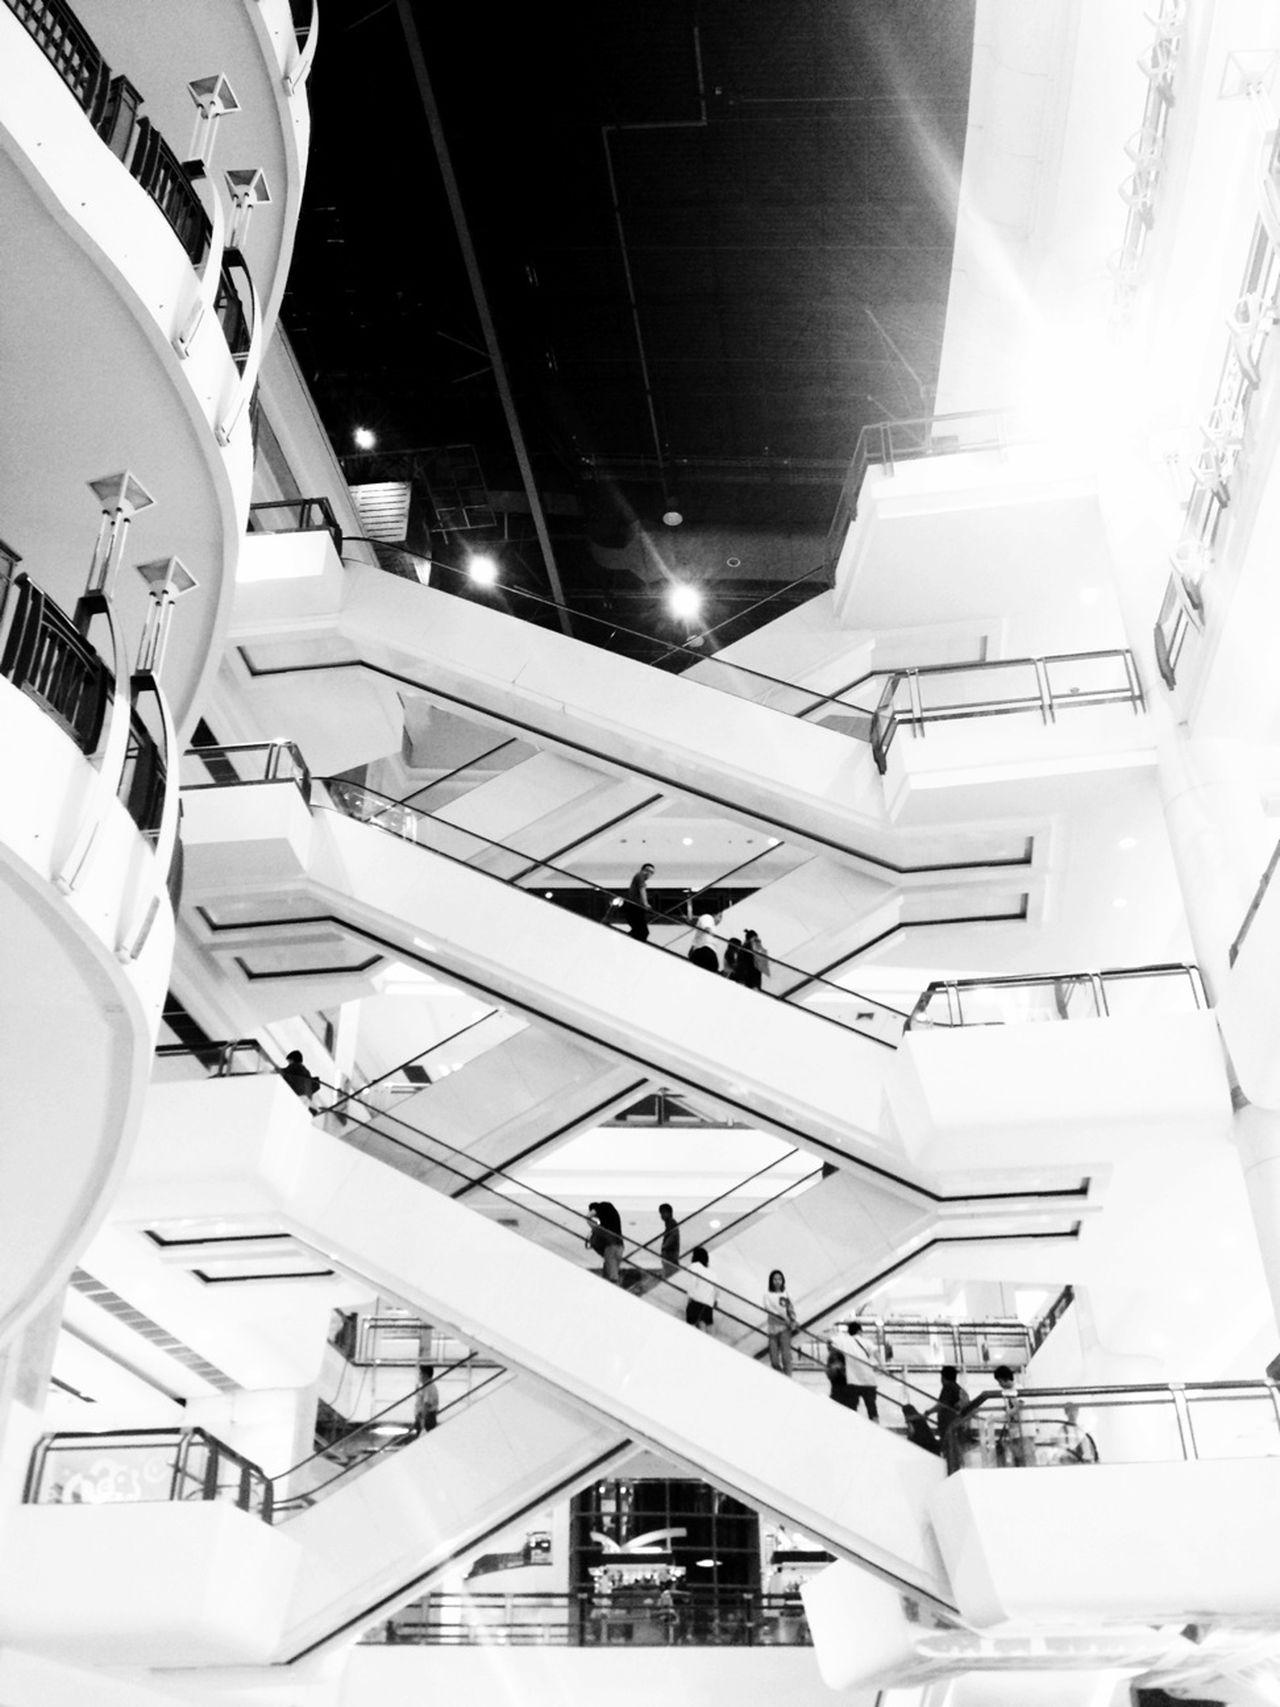 Escalator Blackandwhite Urban Geometry Deceptively Simple